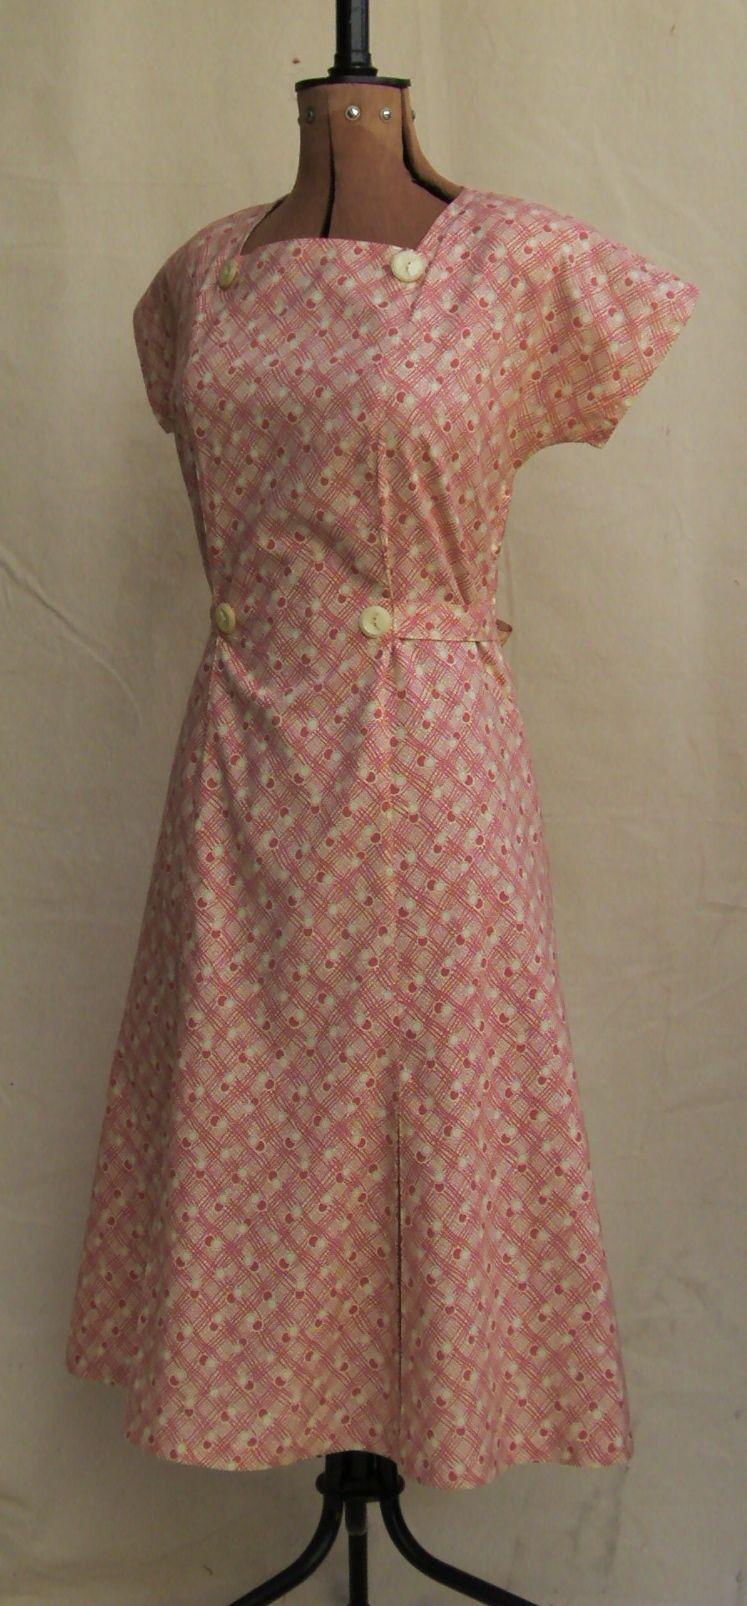 Vintage Reproduction 1930s Summer Dress In Pink Feedsack Type Cotton Vintage Fashion Farm Dress Vintage Dresses Casual [ 1606 x 747 Pixel ]